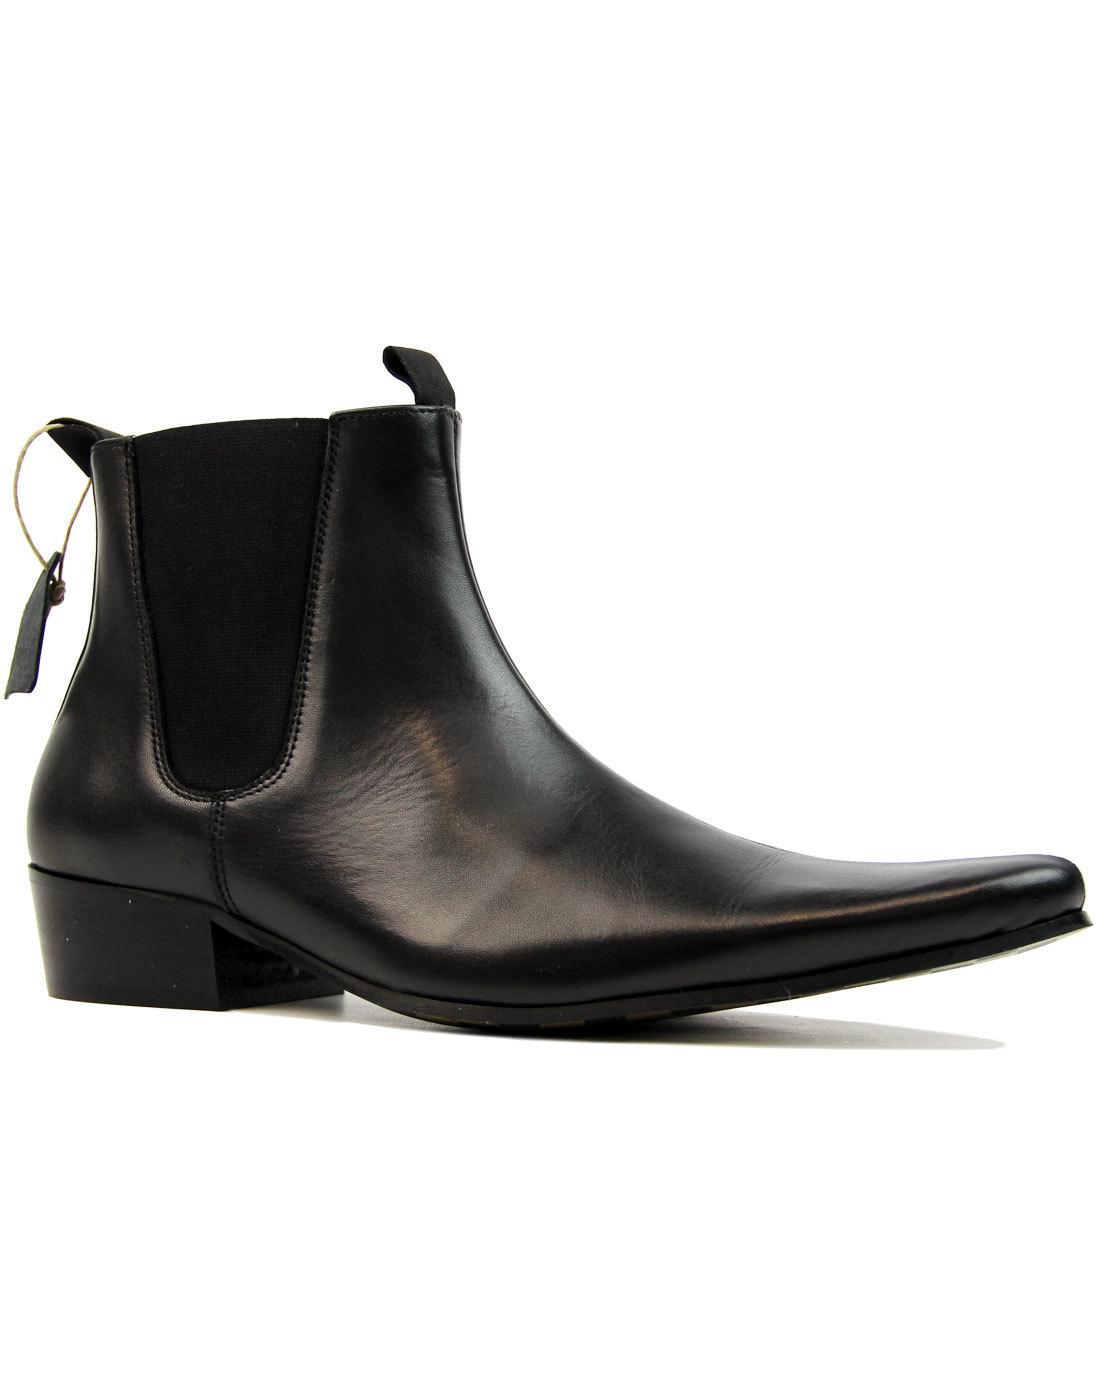 'Beatle' Retro Mod Chelsea Cuban Leather Boots (B)